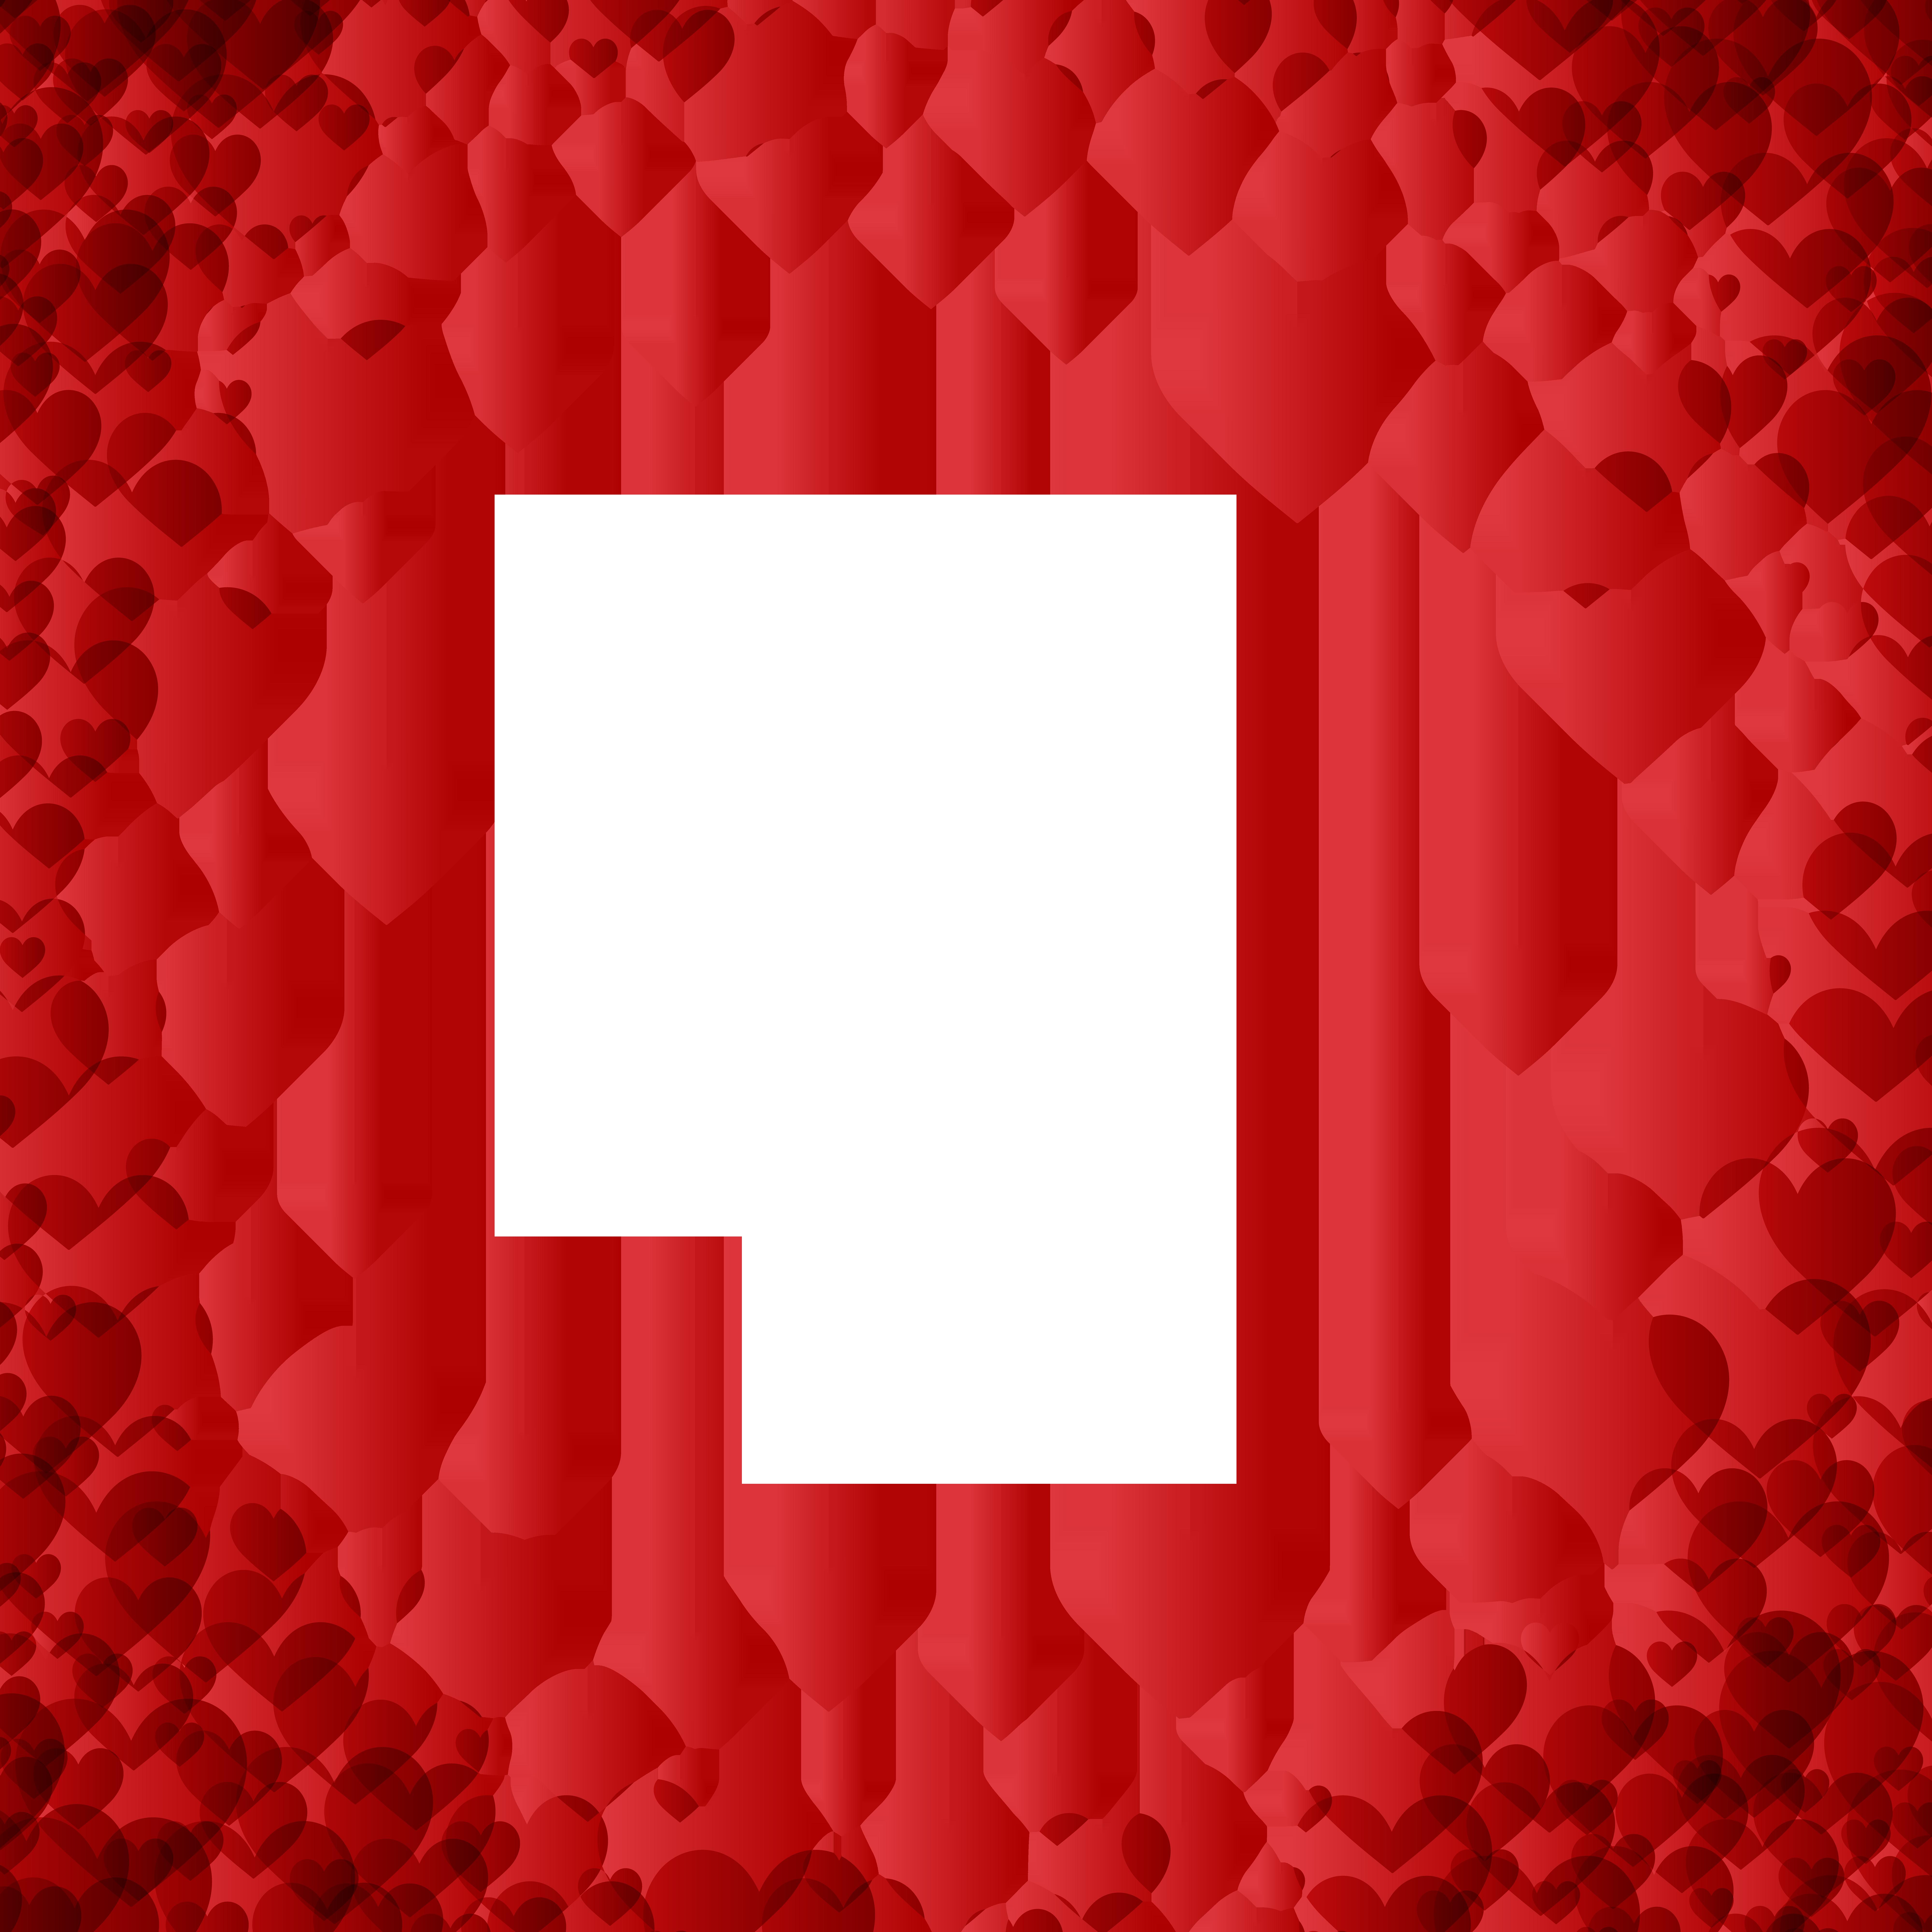 Valentine\'s Day Heart Border Frame Transparent Image.